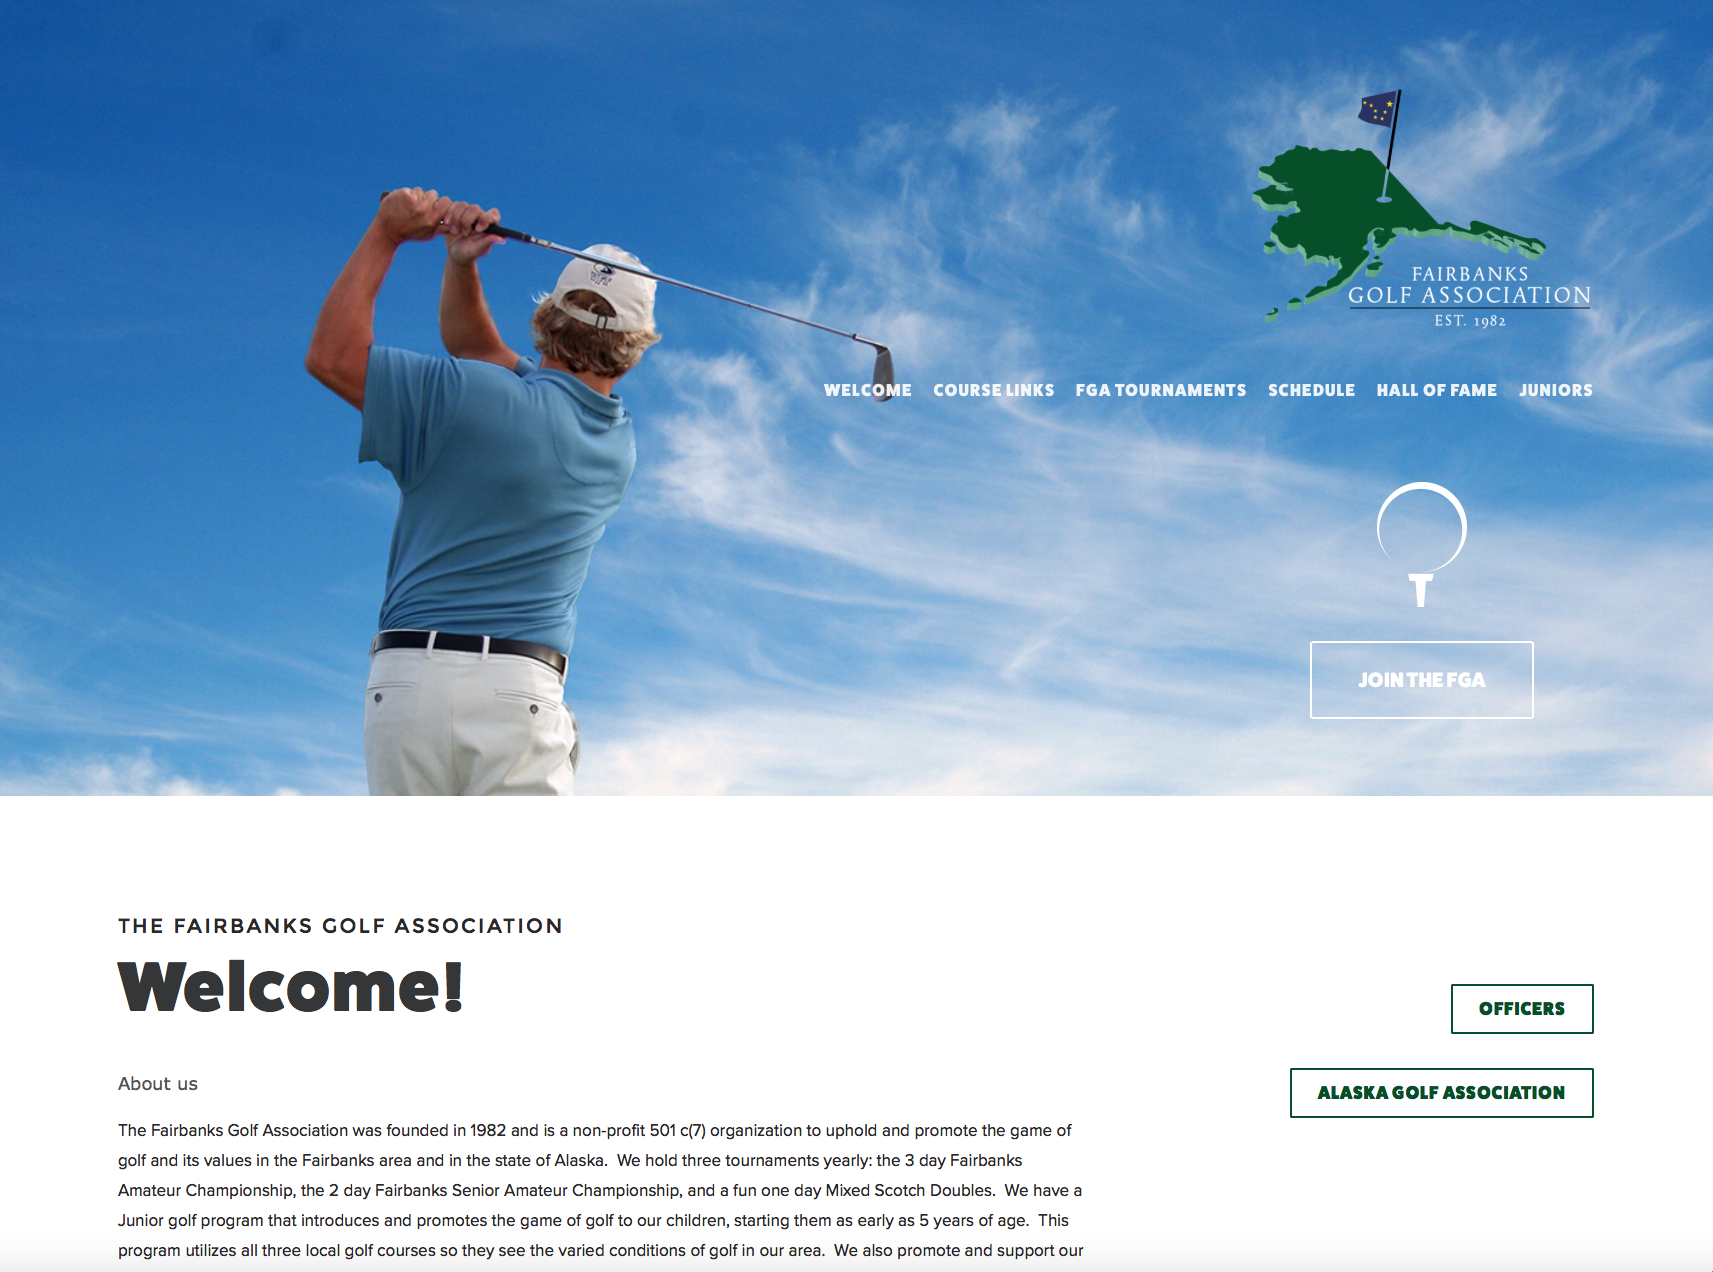 Fairbanks Golf Association